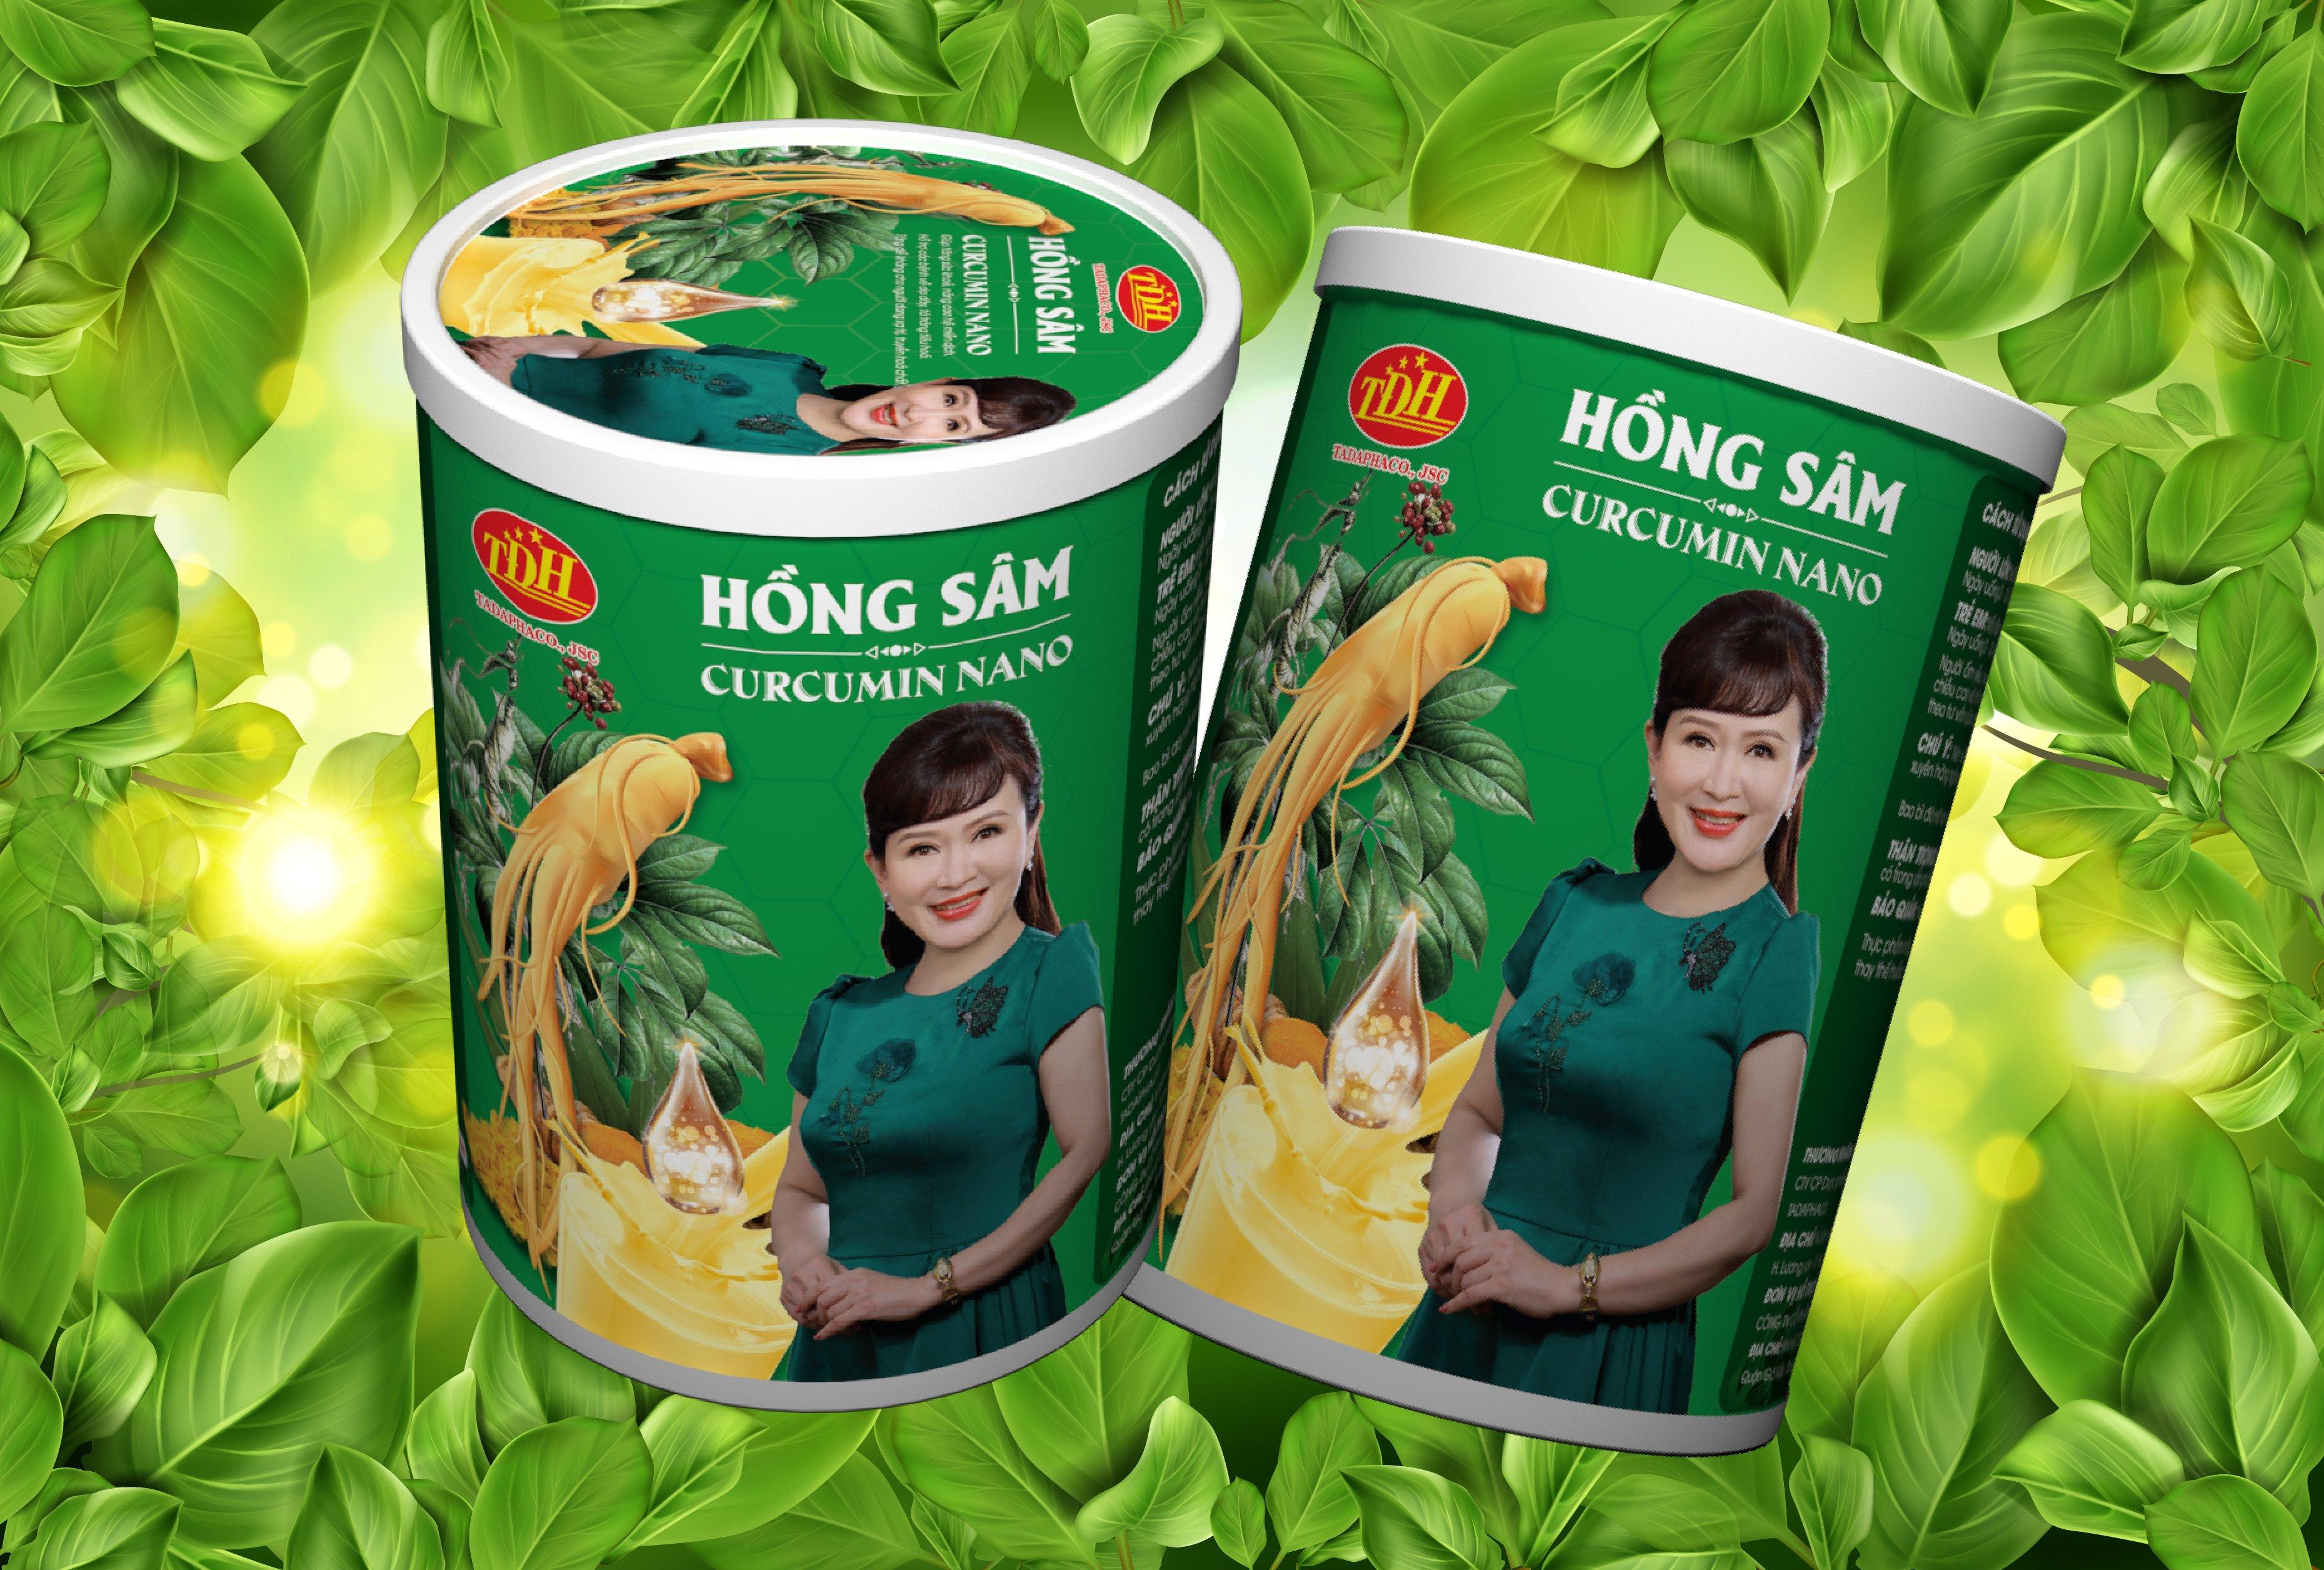 hong-sam-curcumin-nano-anh-14